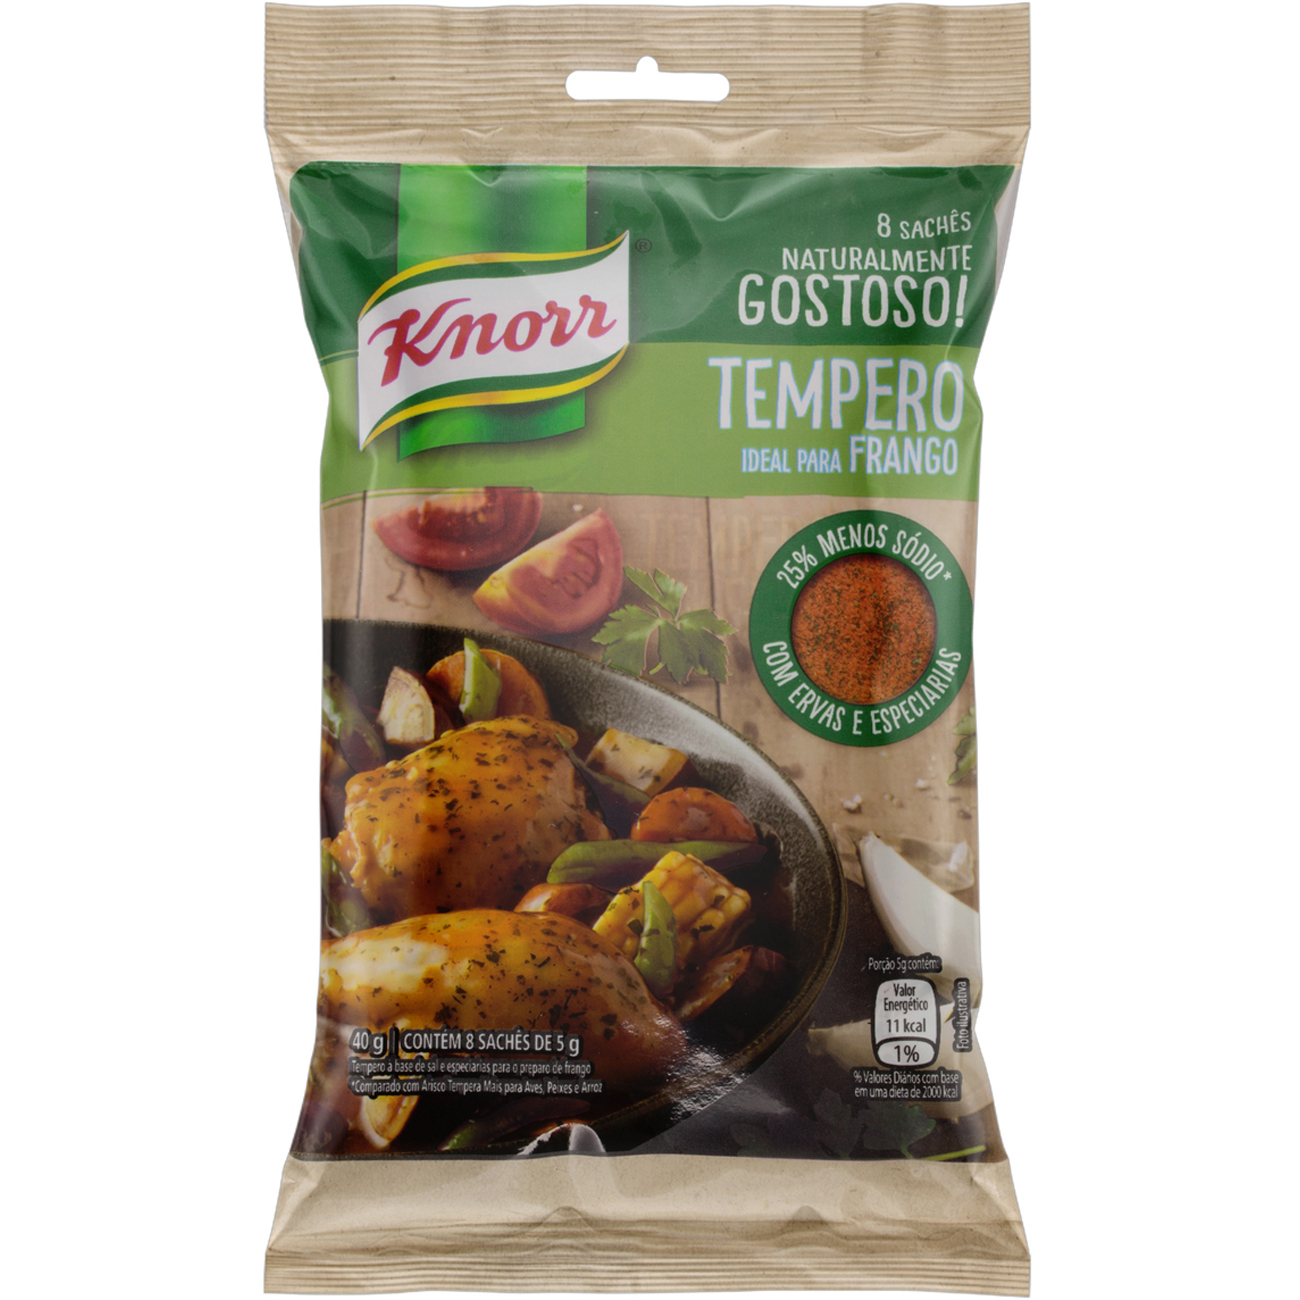 Tempero Knorr Ideal Para Frango 40G